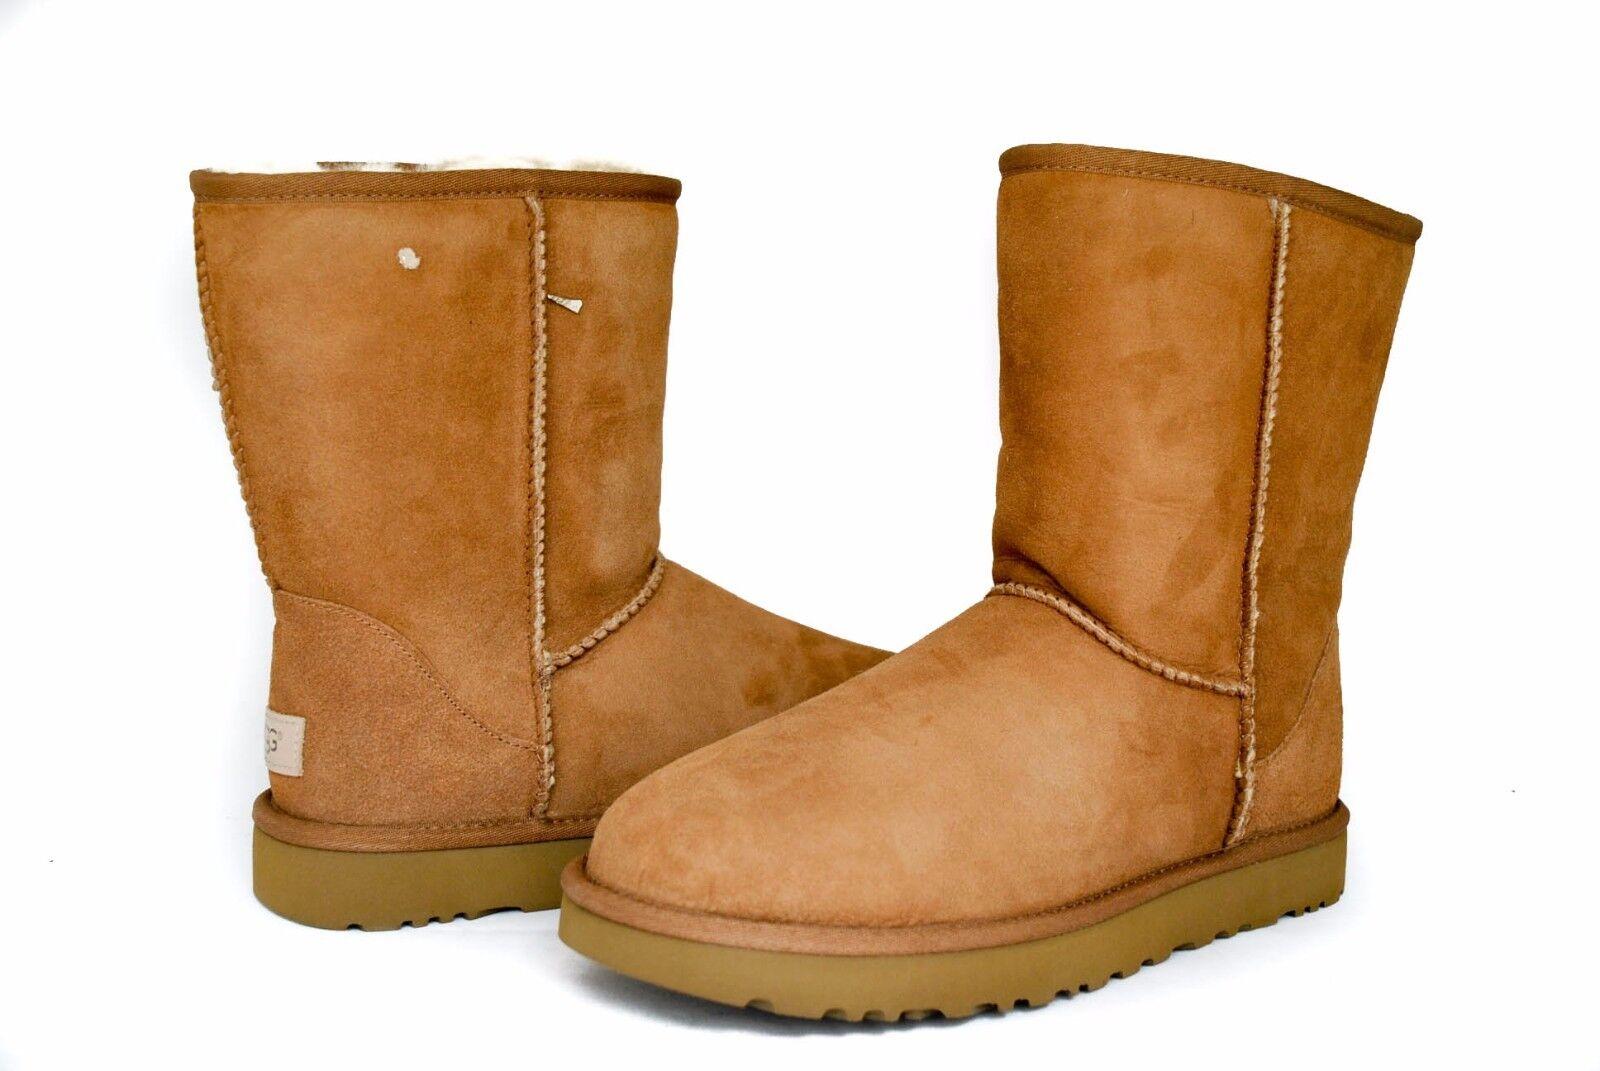 UGG Women's Classic Short 2 II Boots 1016223 Black Chestnut Grey NEW Version